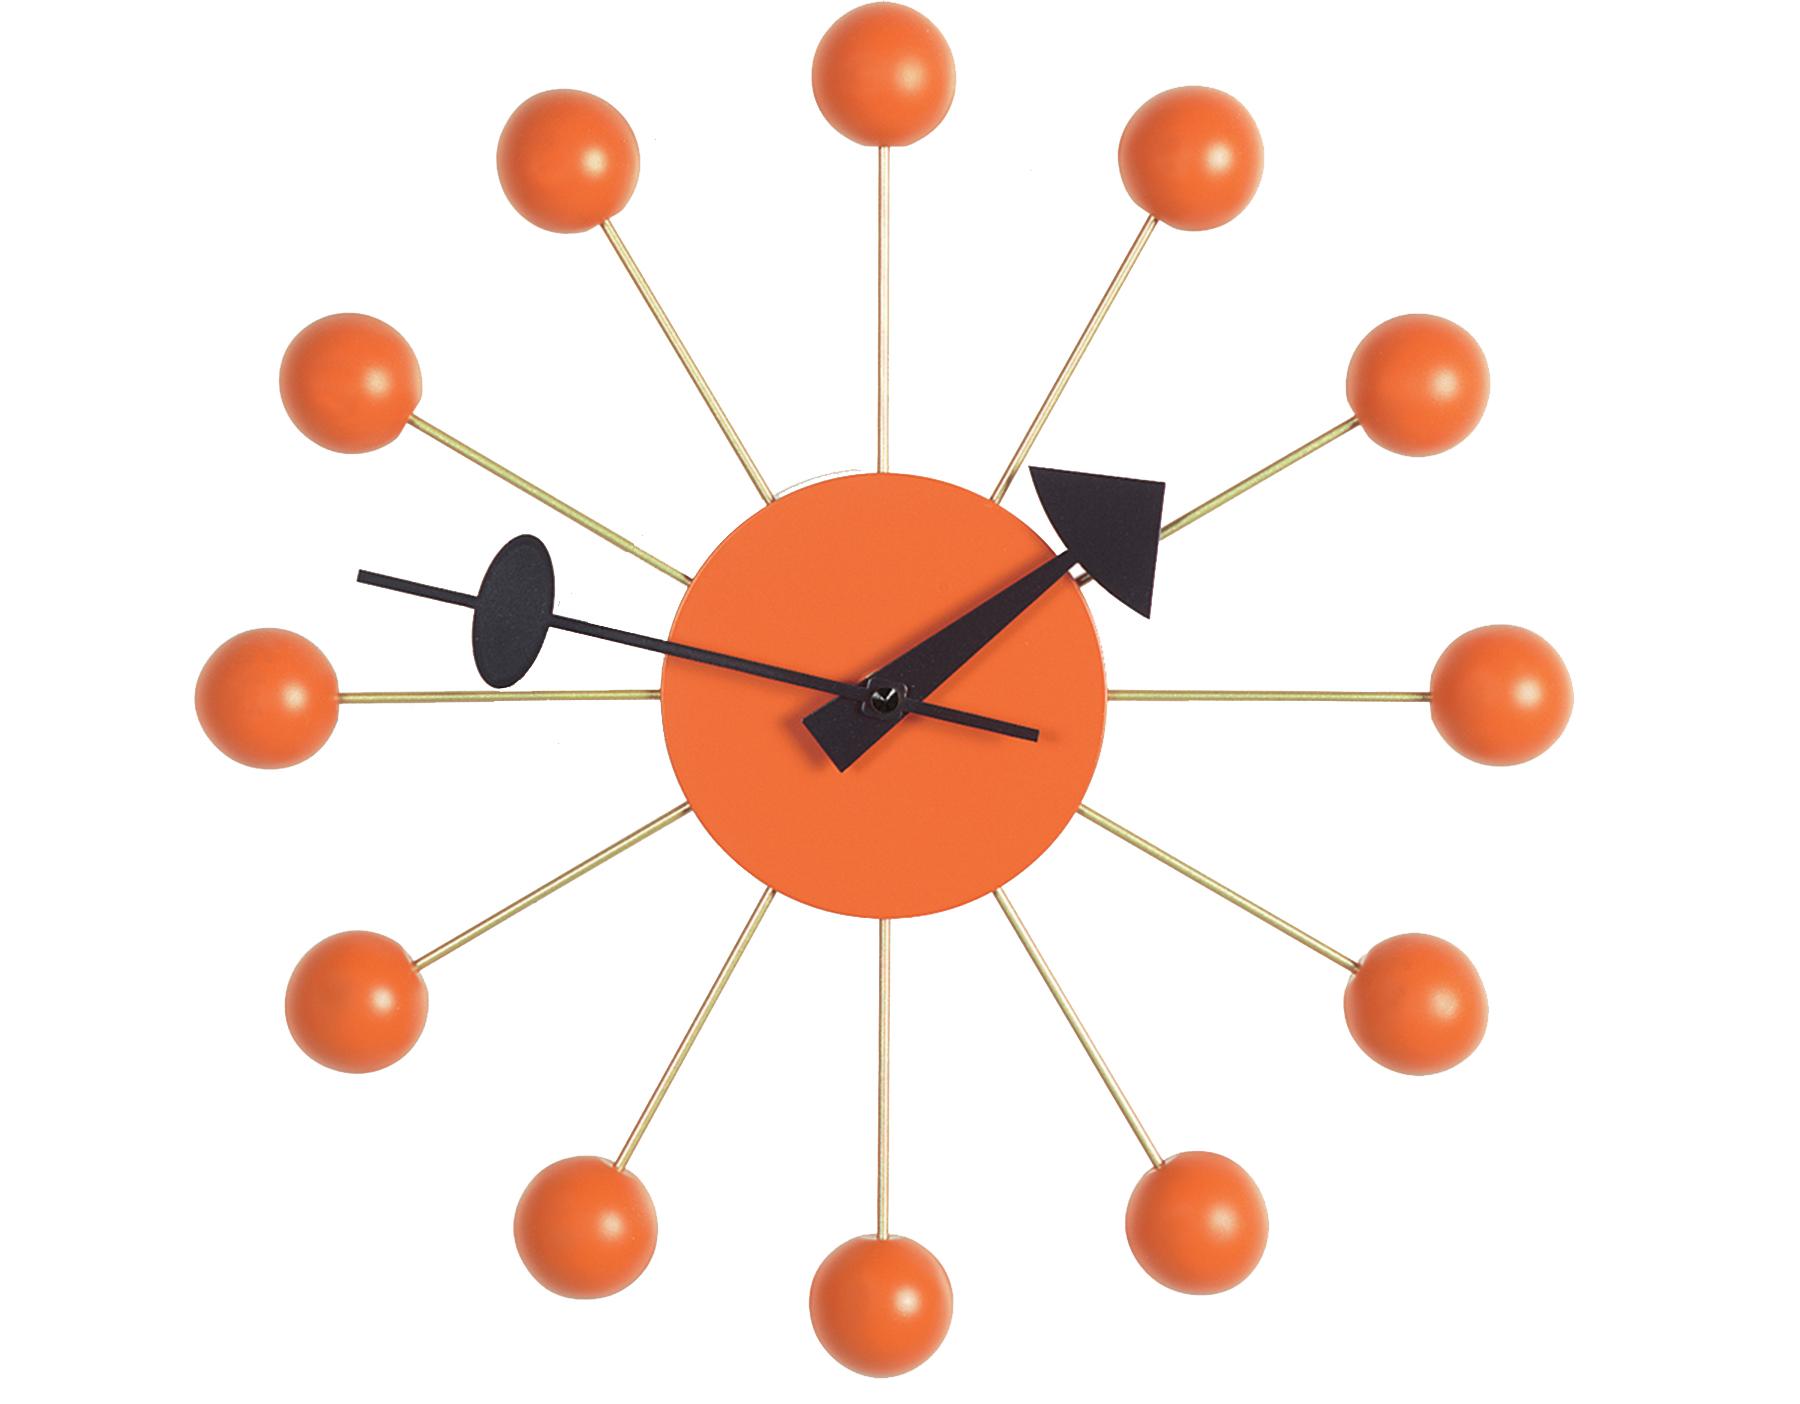 george-nelson-ball-clock-orange-vitra-1.jpg